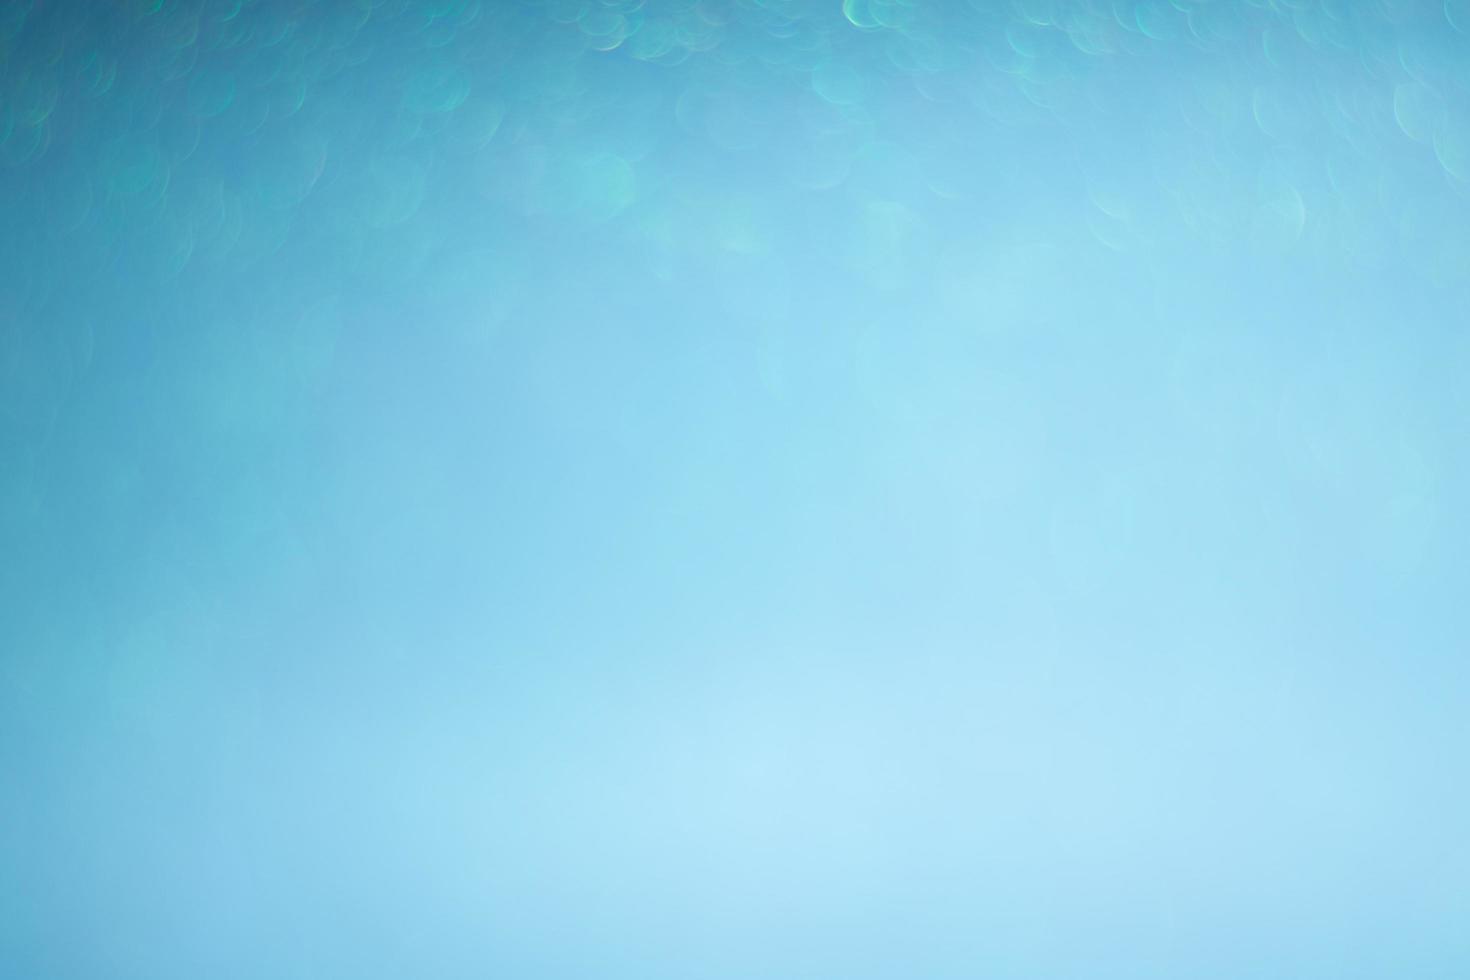 astratto sfondo blu bokeh foto